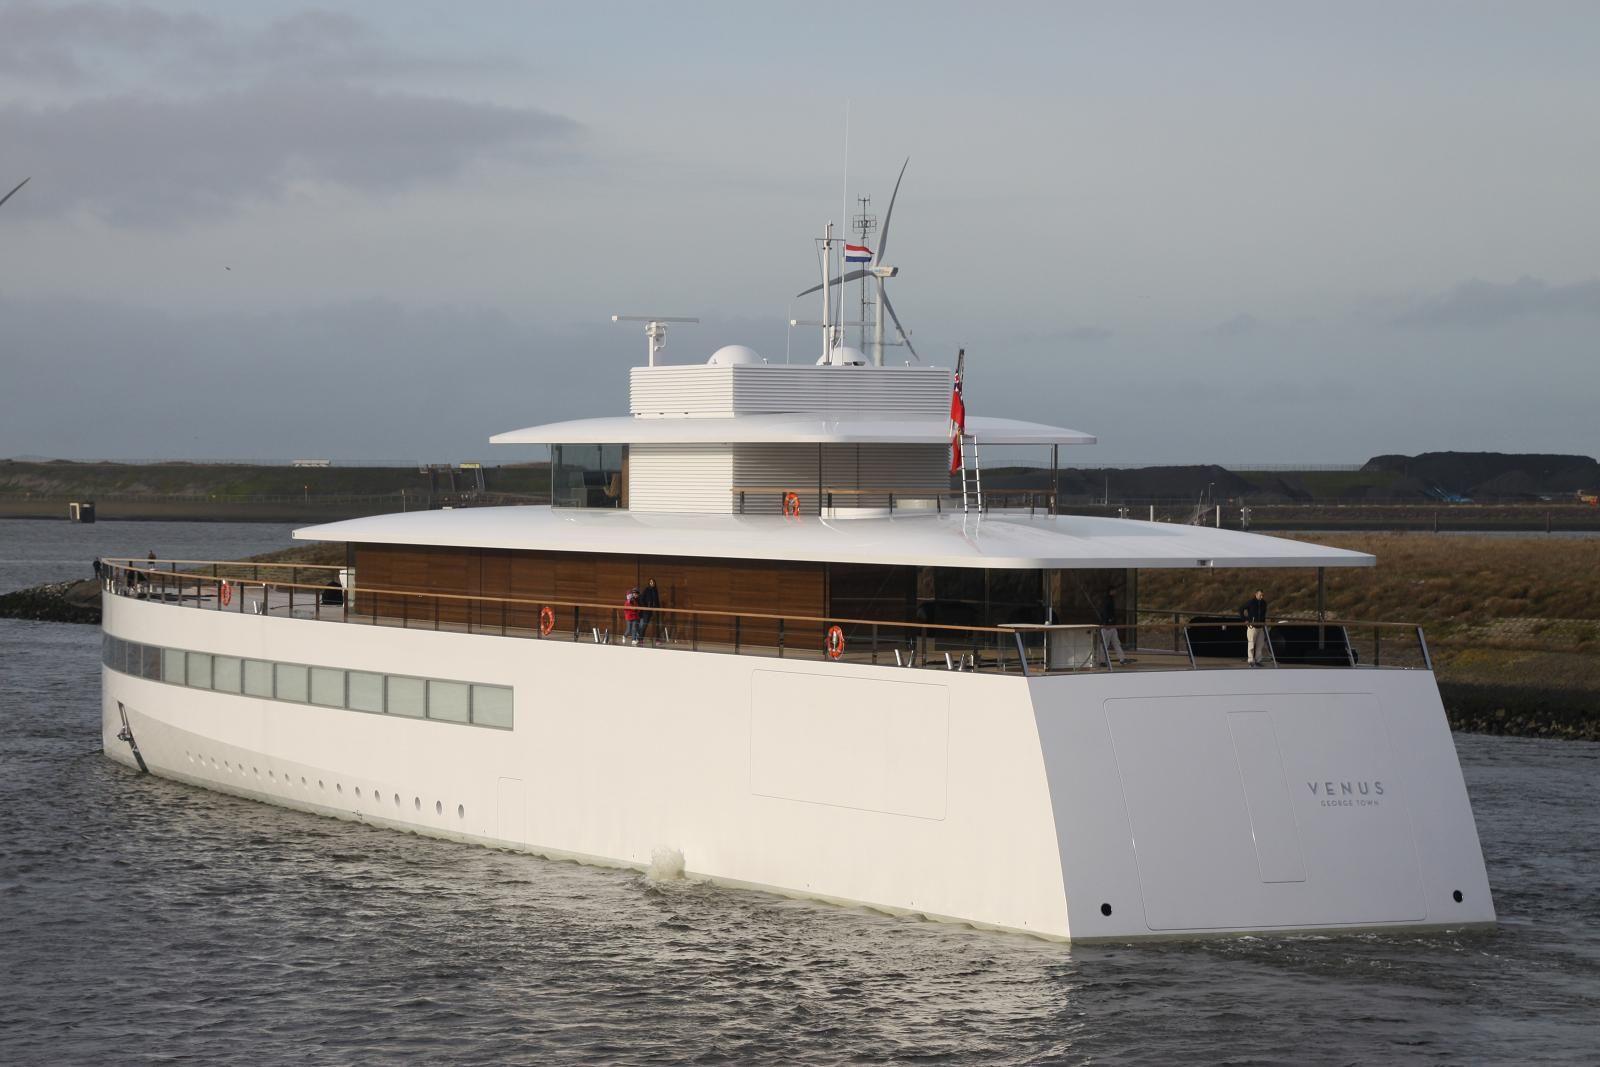 Steve Jobs Superyacht The Venus Sorry Folks But This Is Just Plain